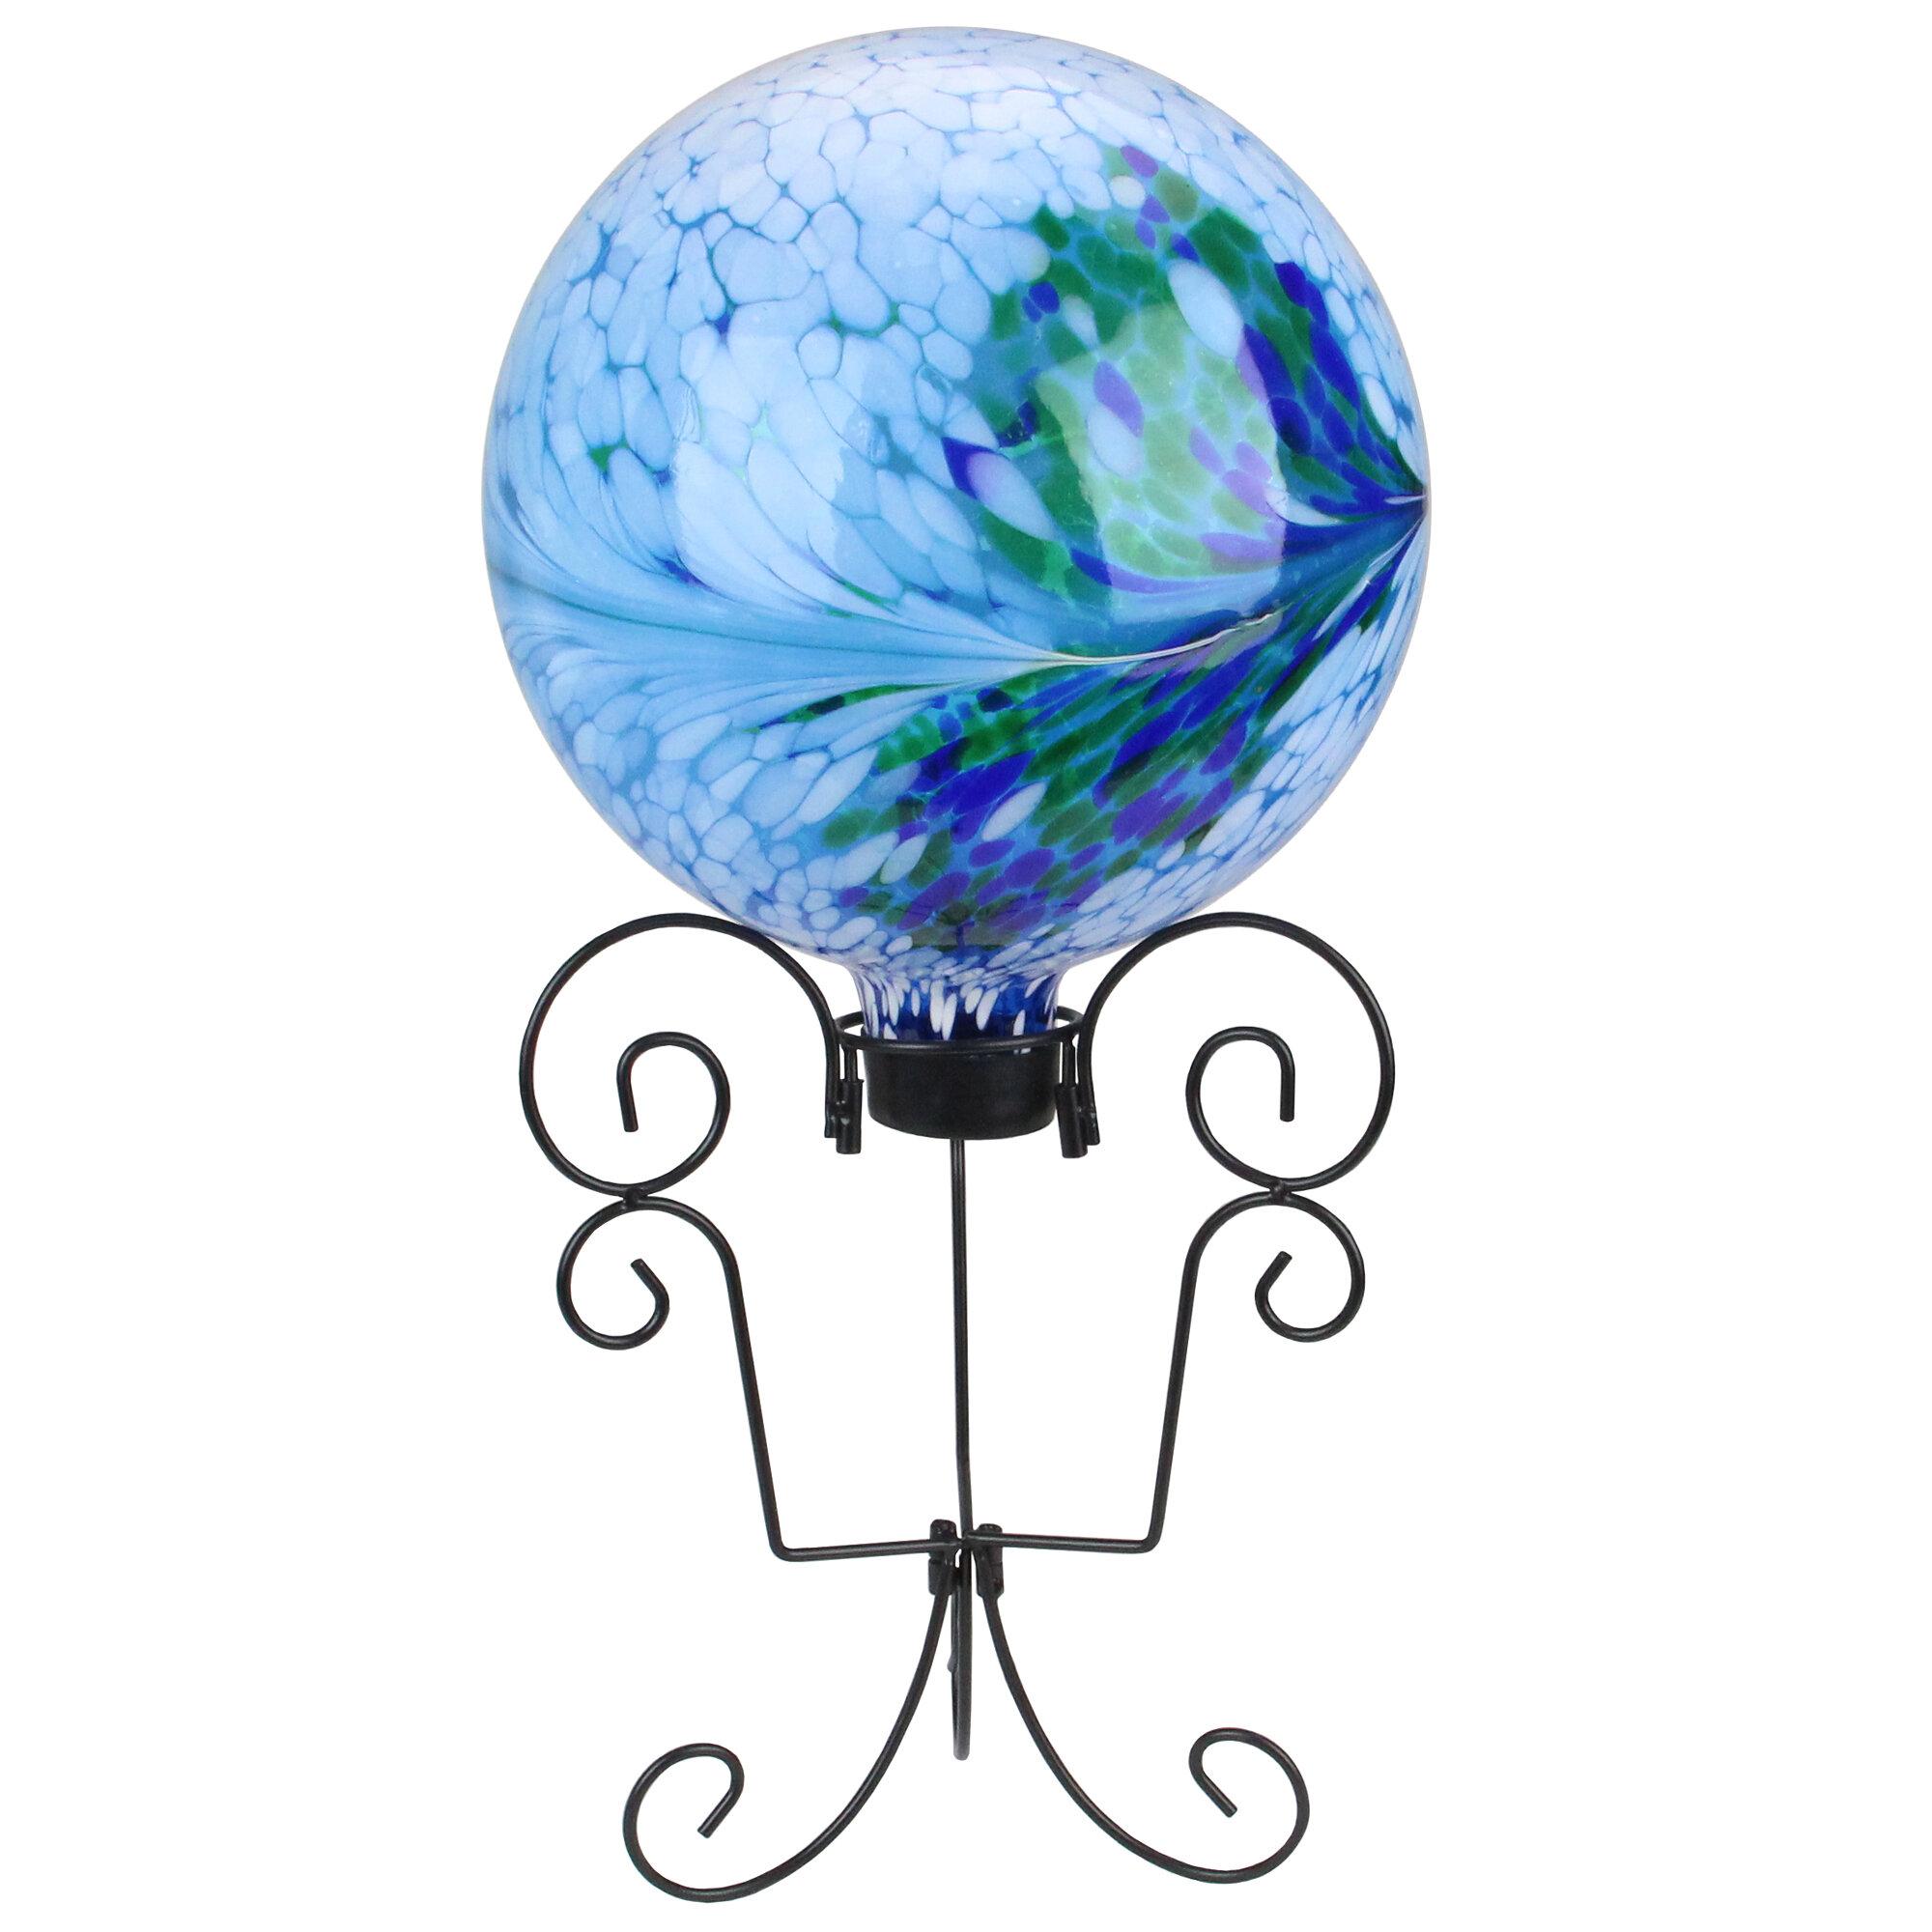 "Northlight 8.25/"" Black Scroll Outdoor Patio Stand for Garden Gazing Balls"